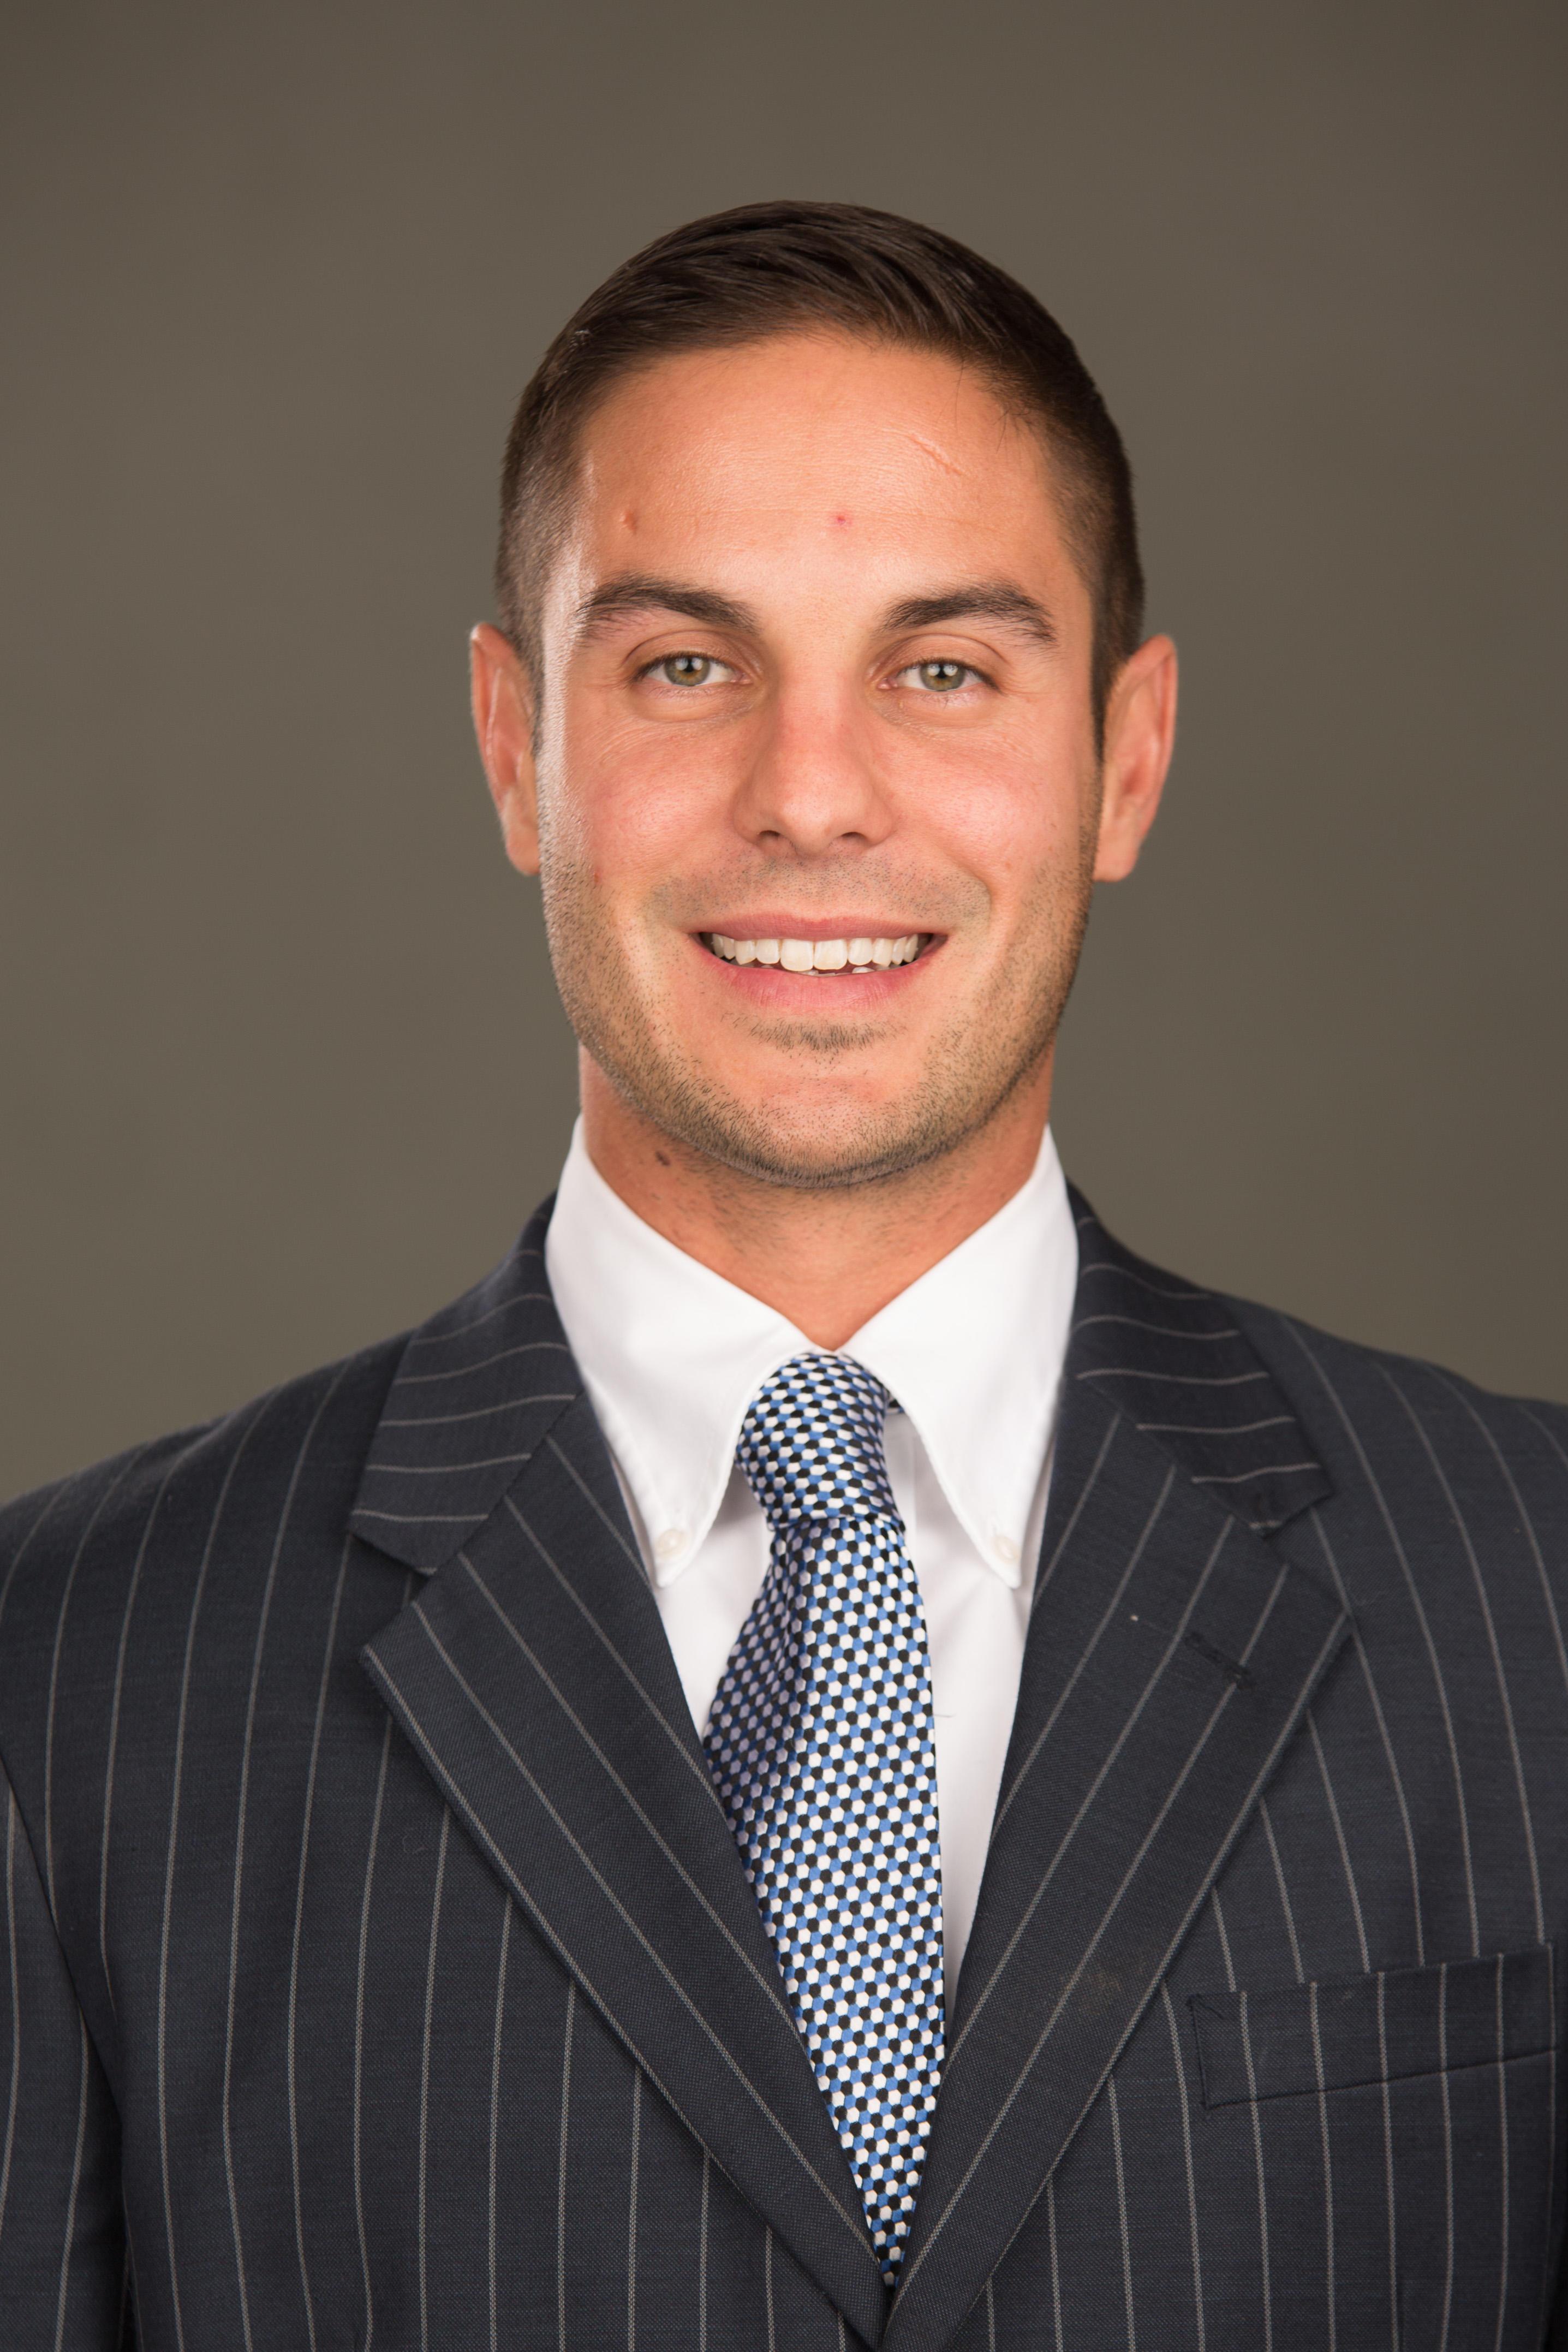 J.M. Insurance & Financial Inc.: Allstate Insurance